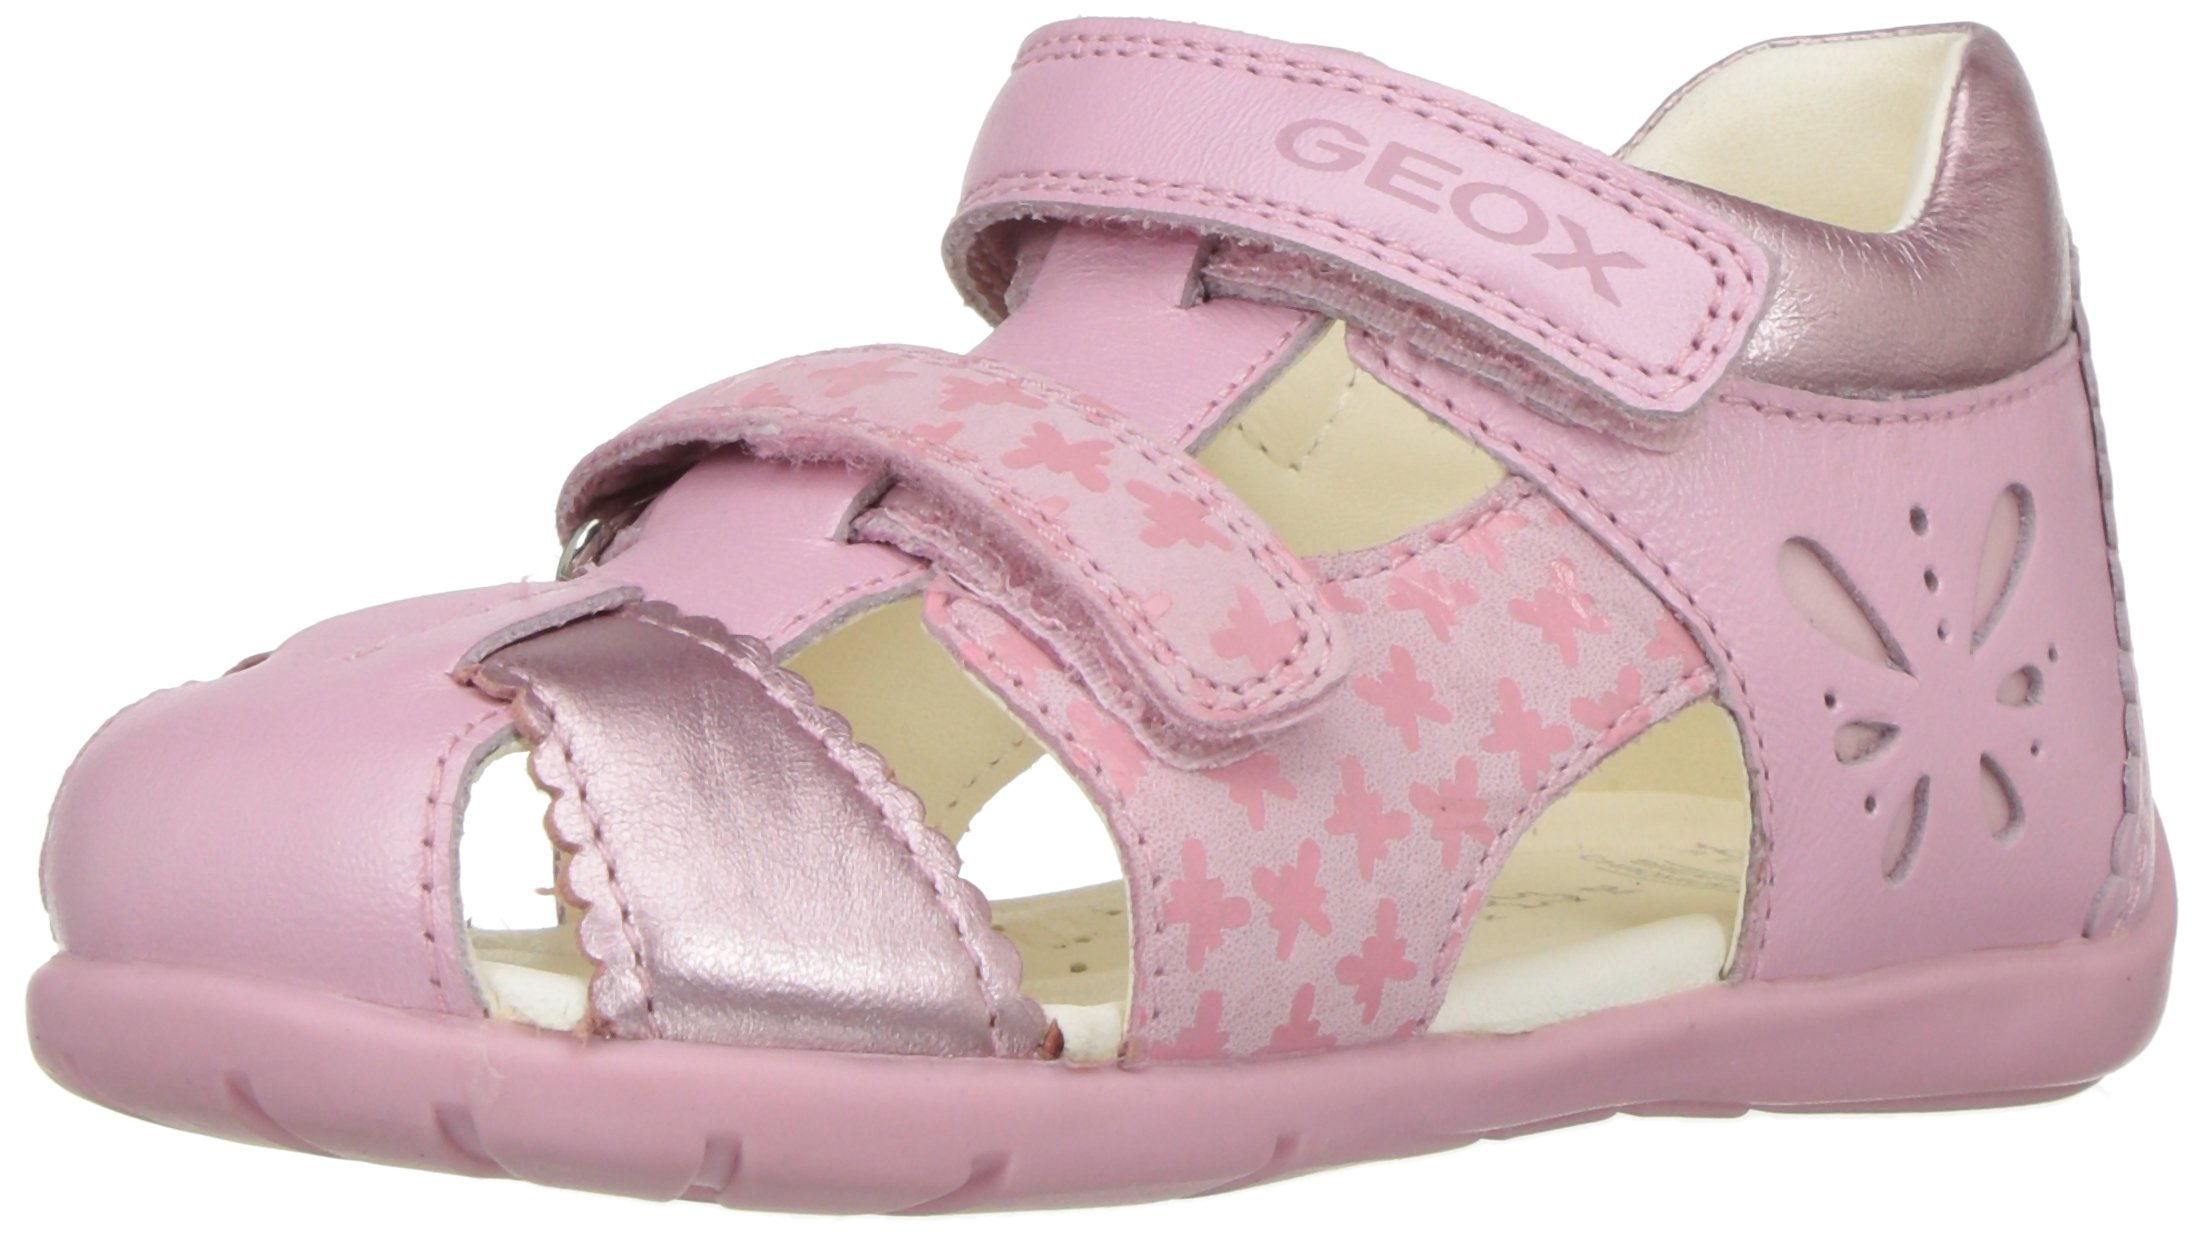 Geox Kids' Baby Kaytangirl 30 Sandal